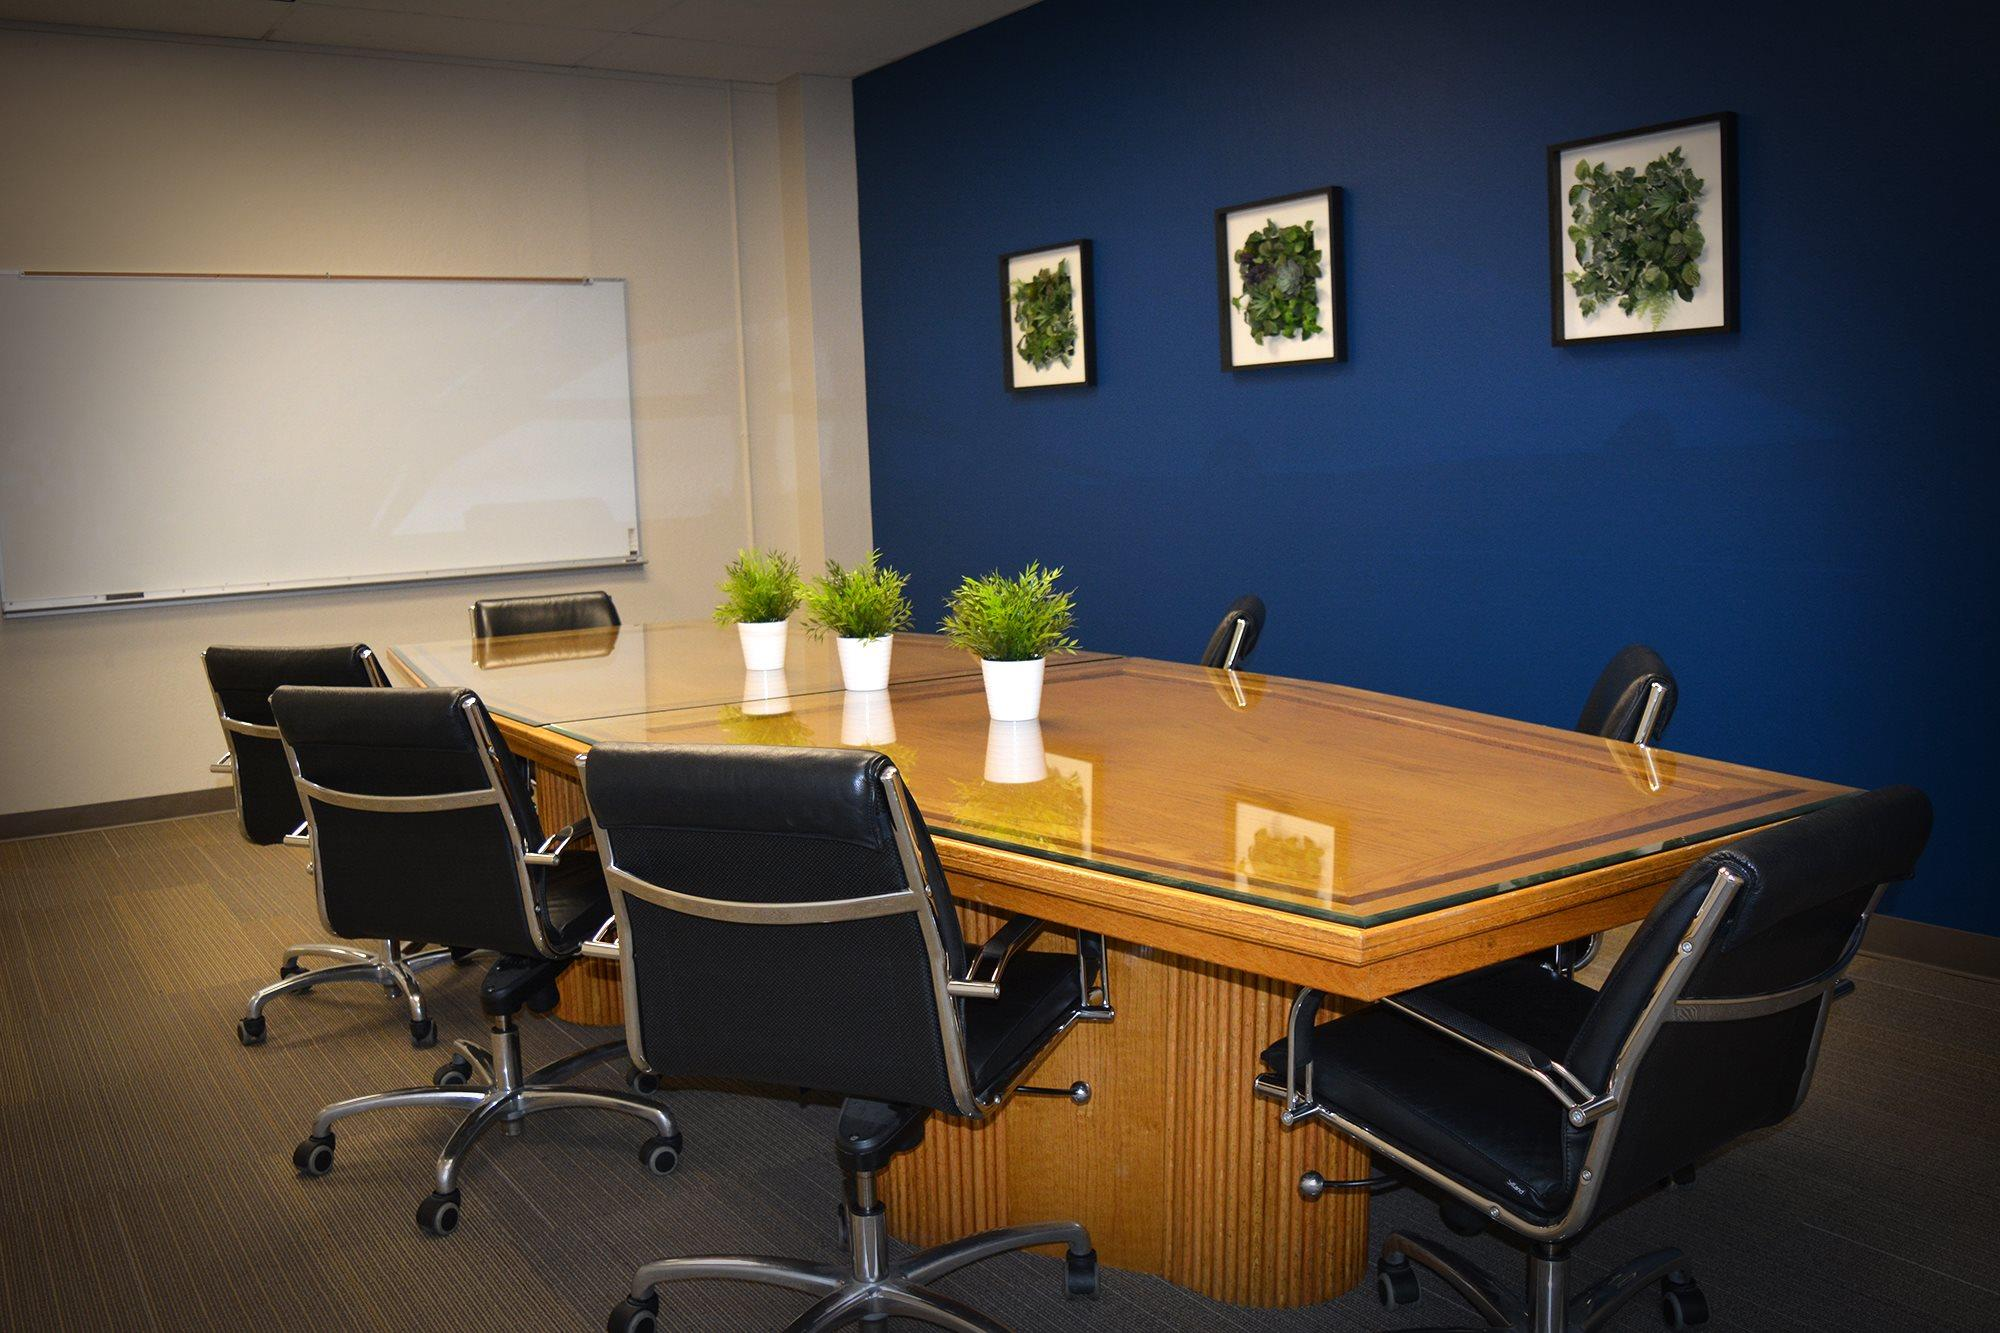 Allegiant Innovation Center - Conference Room